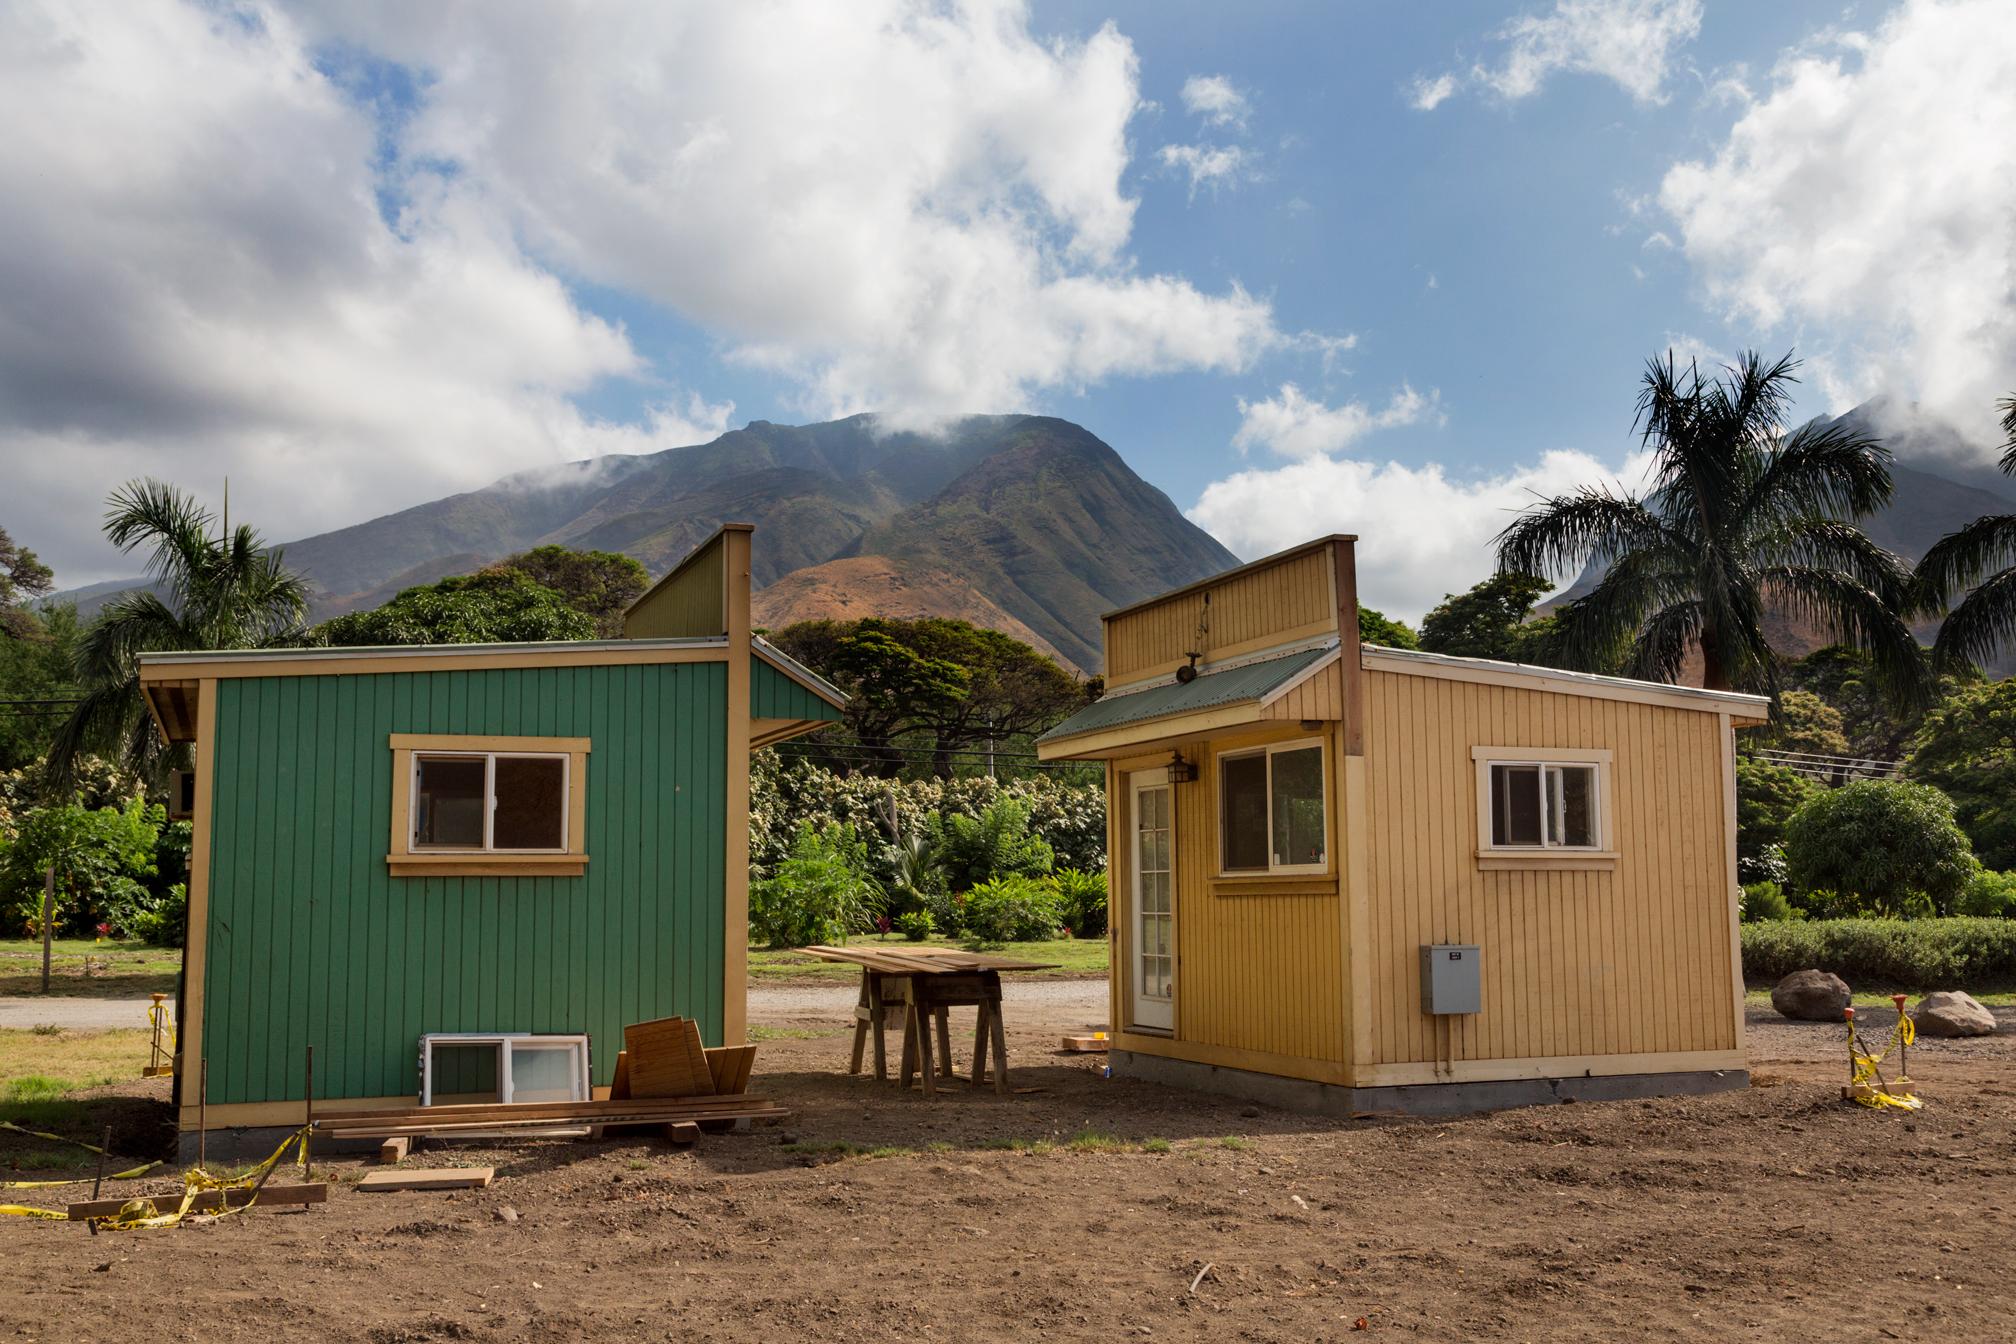 Camp Olowalum, Maui